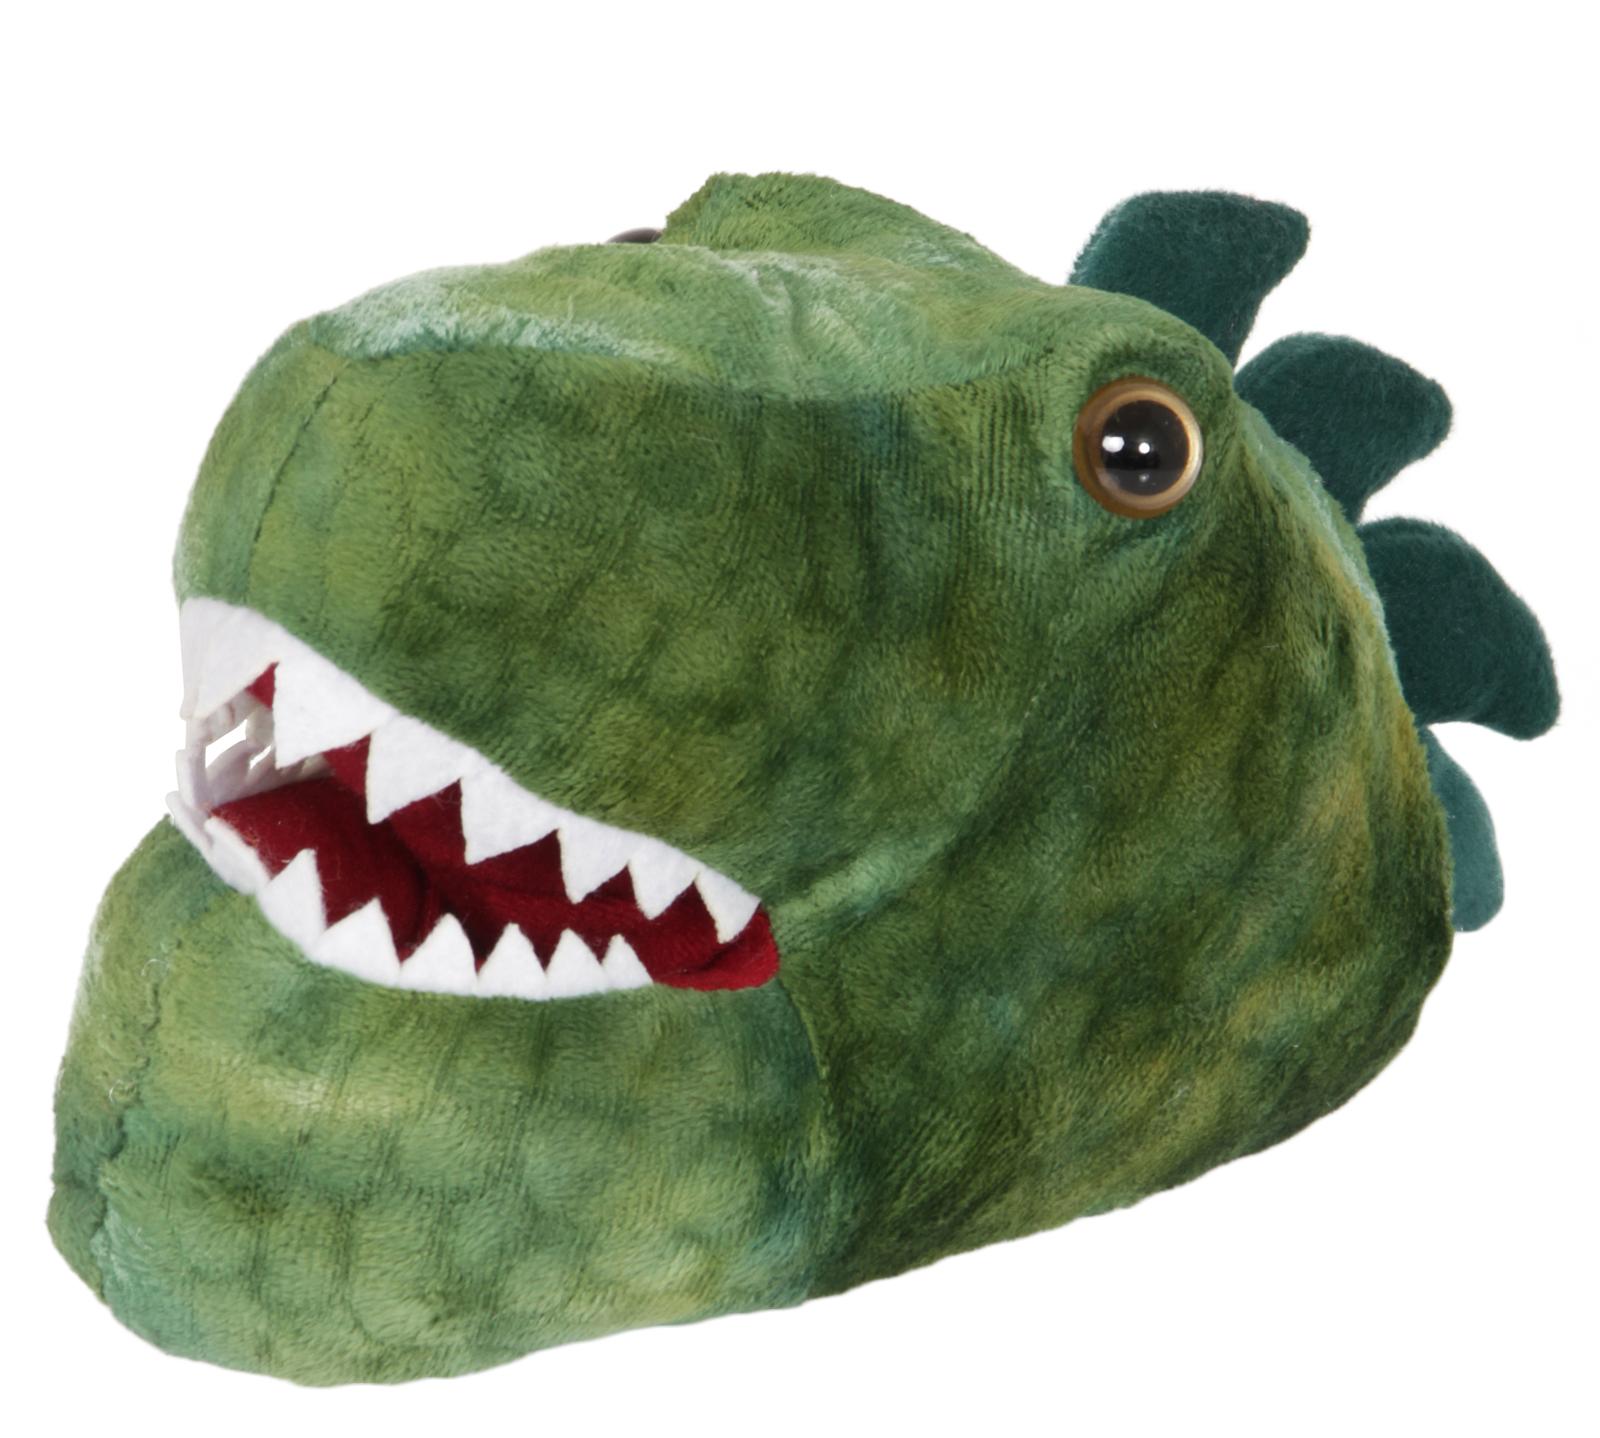 4c40251c11e1 Kids 3D Novelty Dinosaur Slippers Fleece Booties Dino Xmas Gift Boys ...